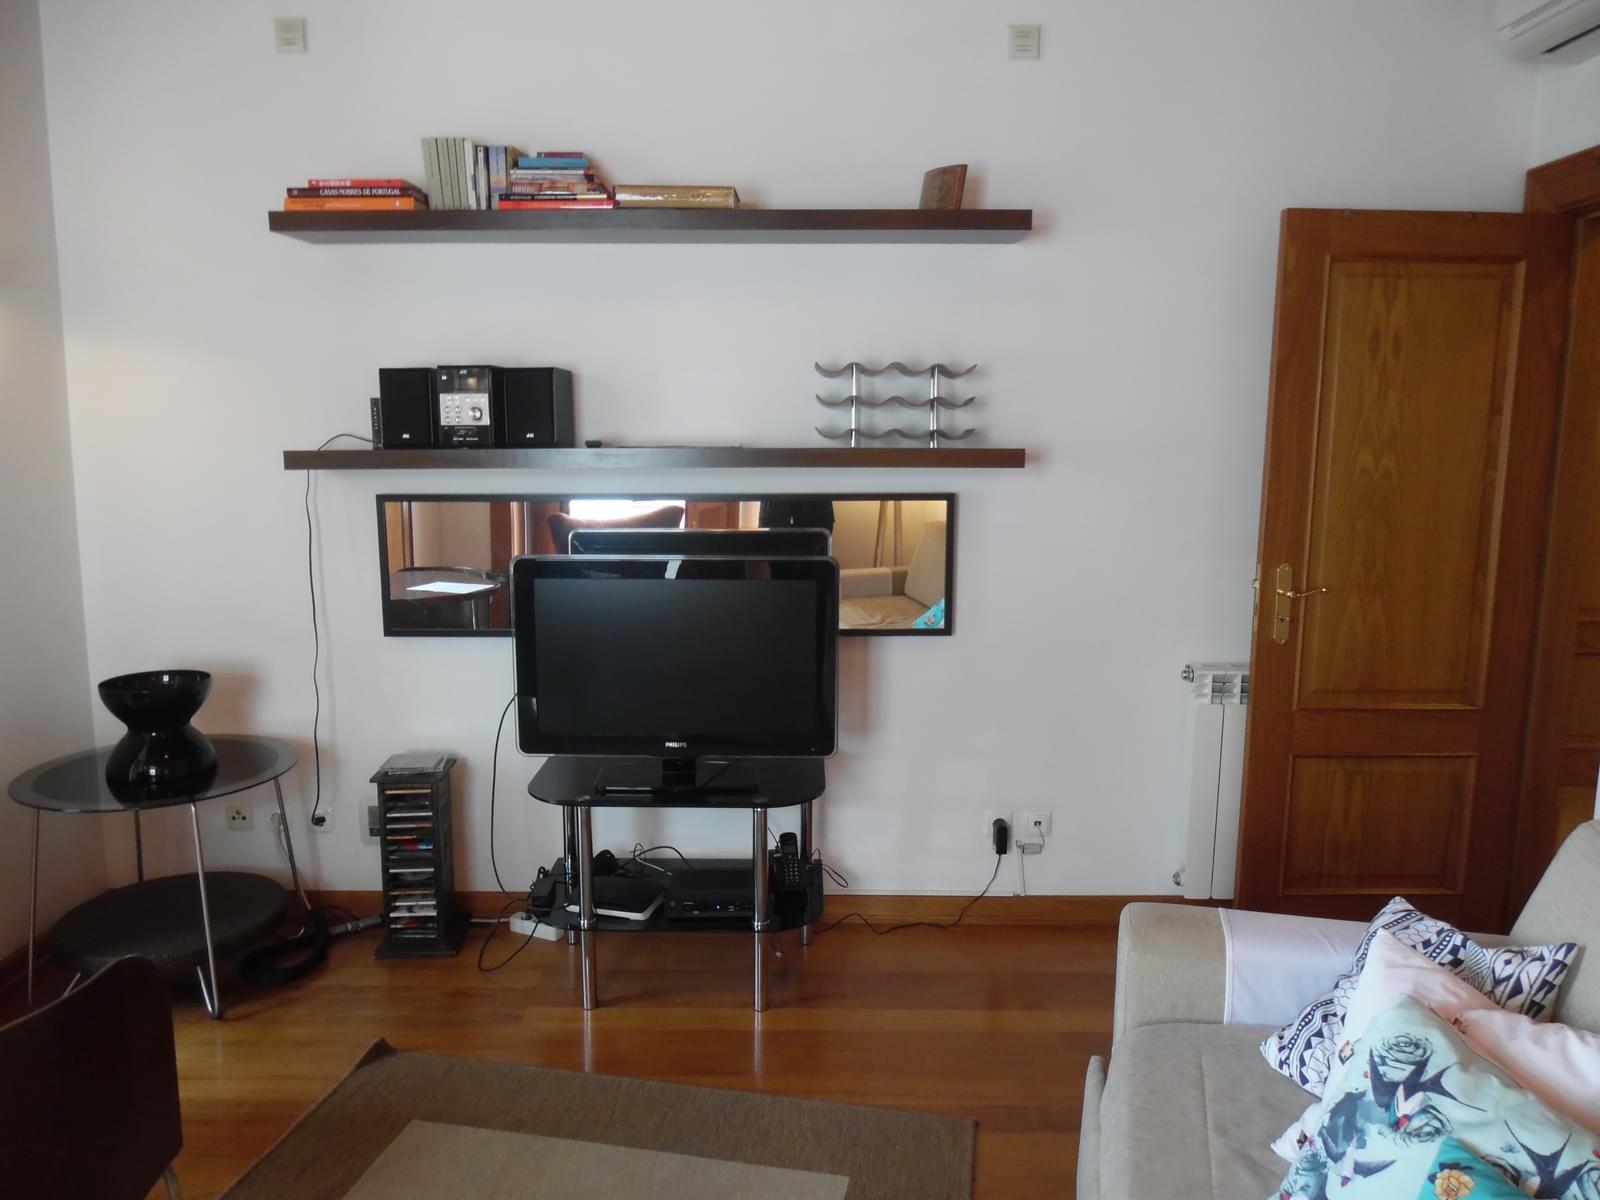 pf16905-apartamento-t1-lisboa-10d4aa68-ed08-48fa-a11b-9375b7fc34ab